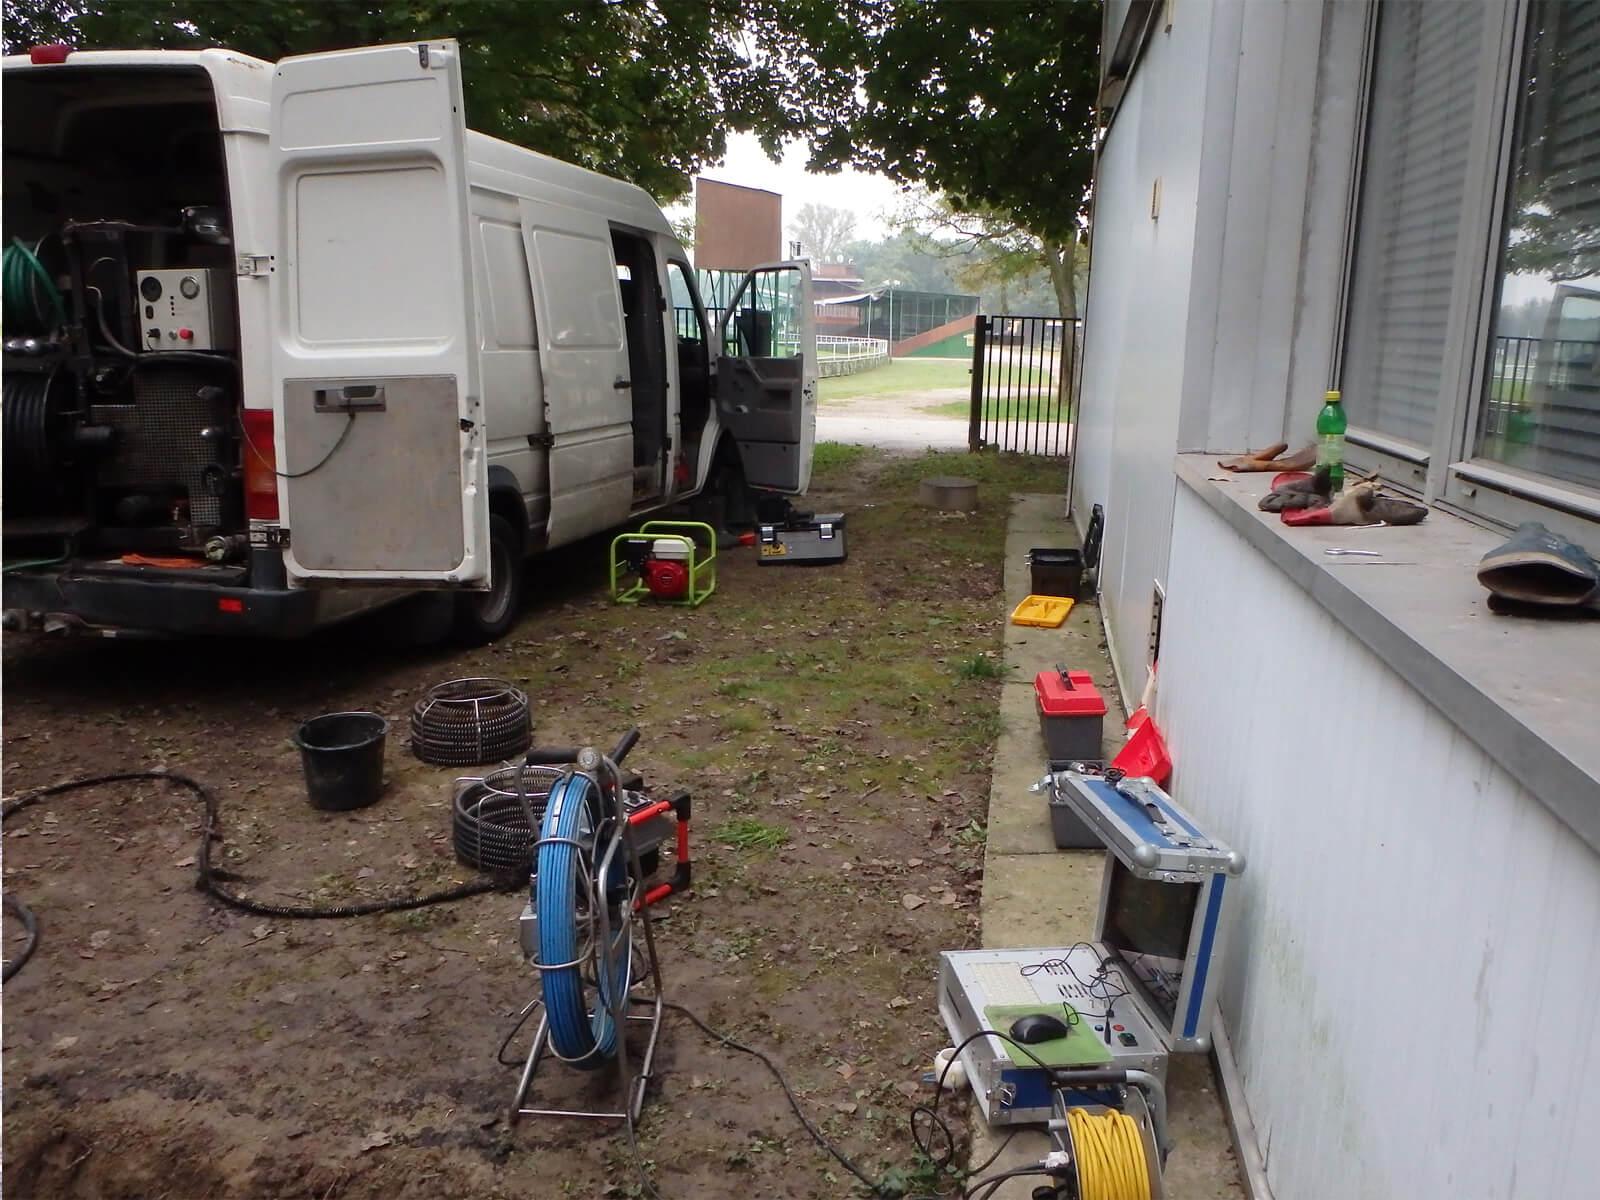 havarijna služba, monitoring kanalizácie, krtkovanie4